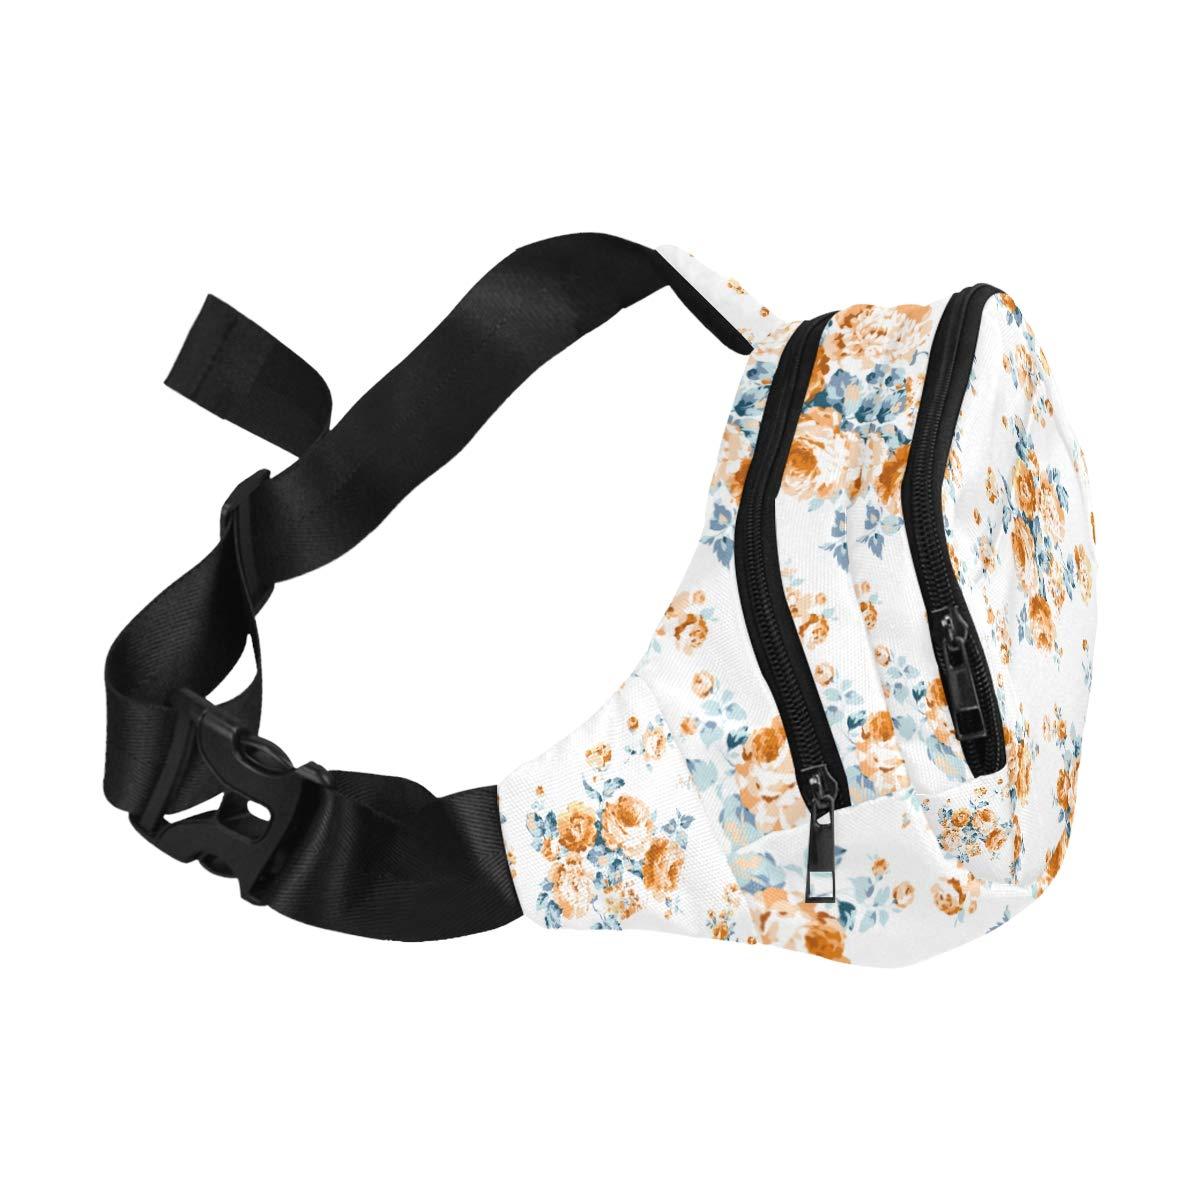 Blooming English Rose Watercolor Fenny Packs Waist Bags Adjustable Belt Waterproof Nylon Travel Running Sport Vacation Party For Men Women Boys Girls Kids